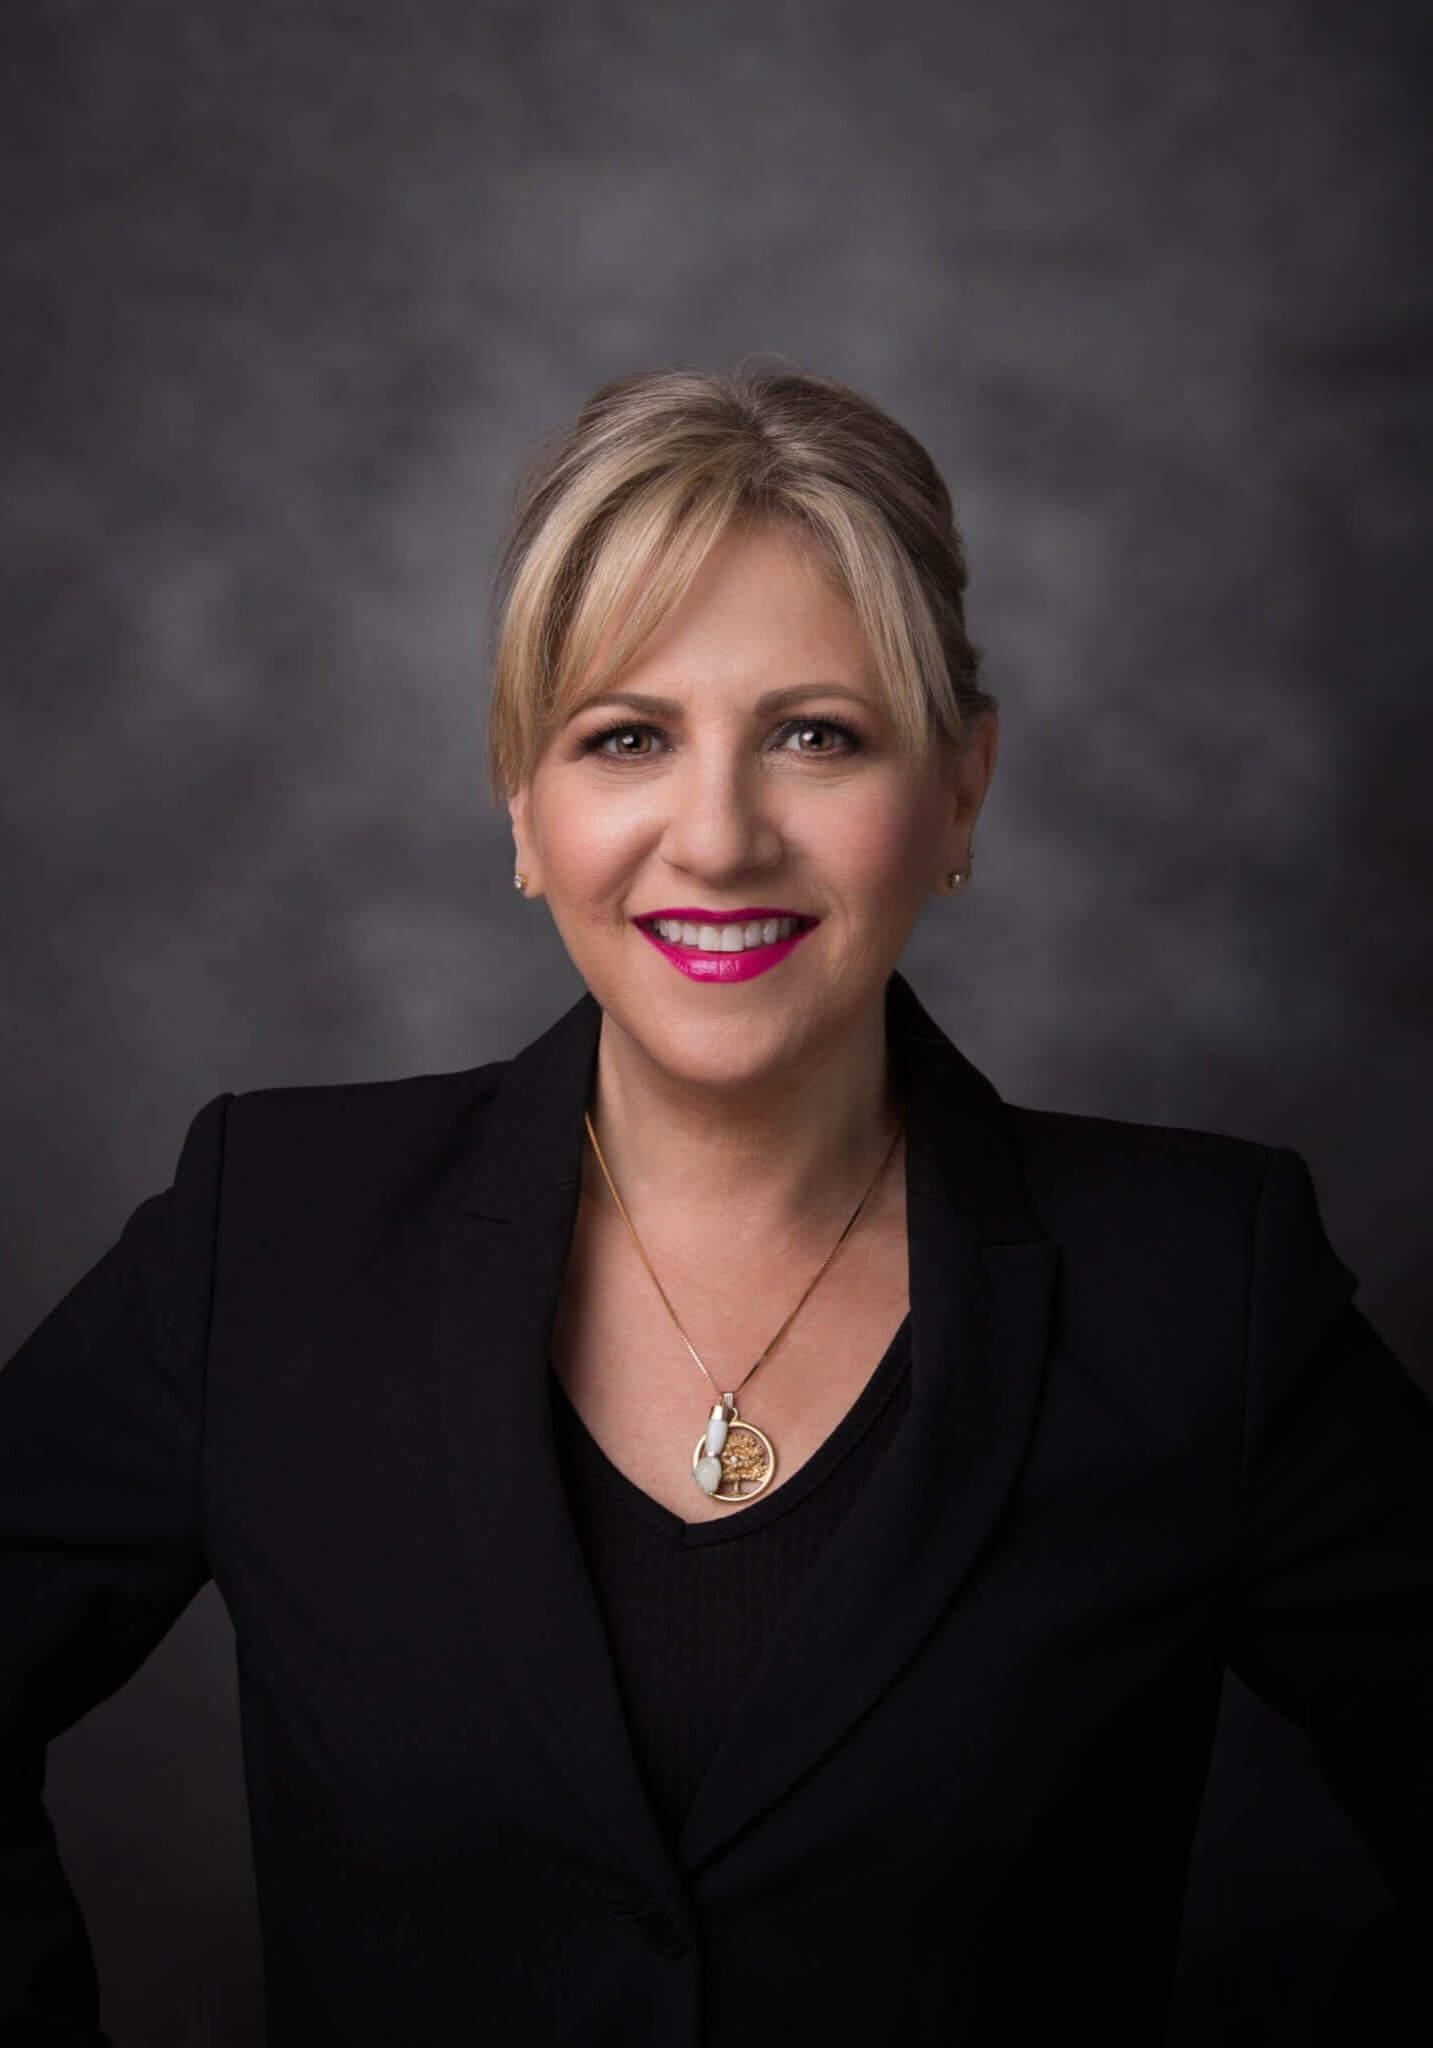 Andrea Engelsberg from ROI Properties